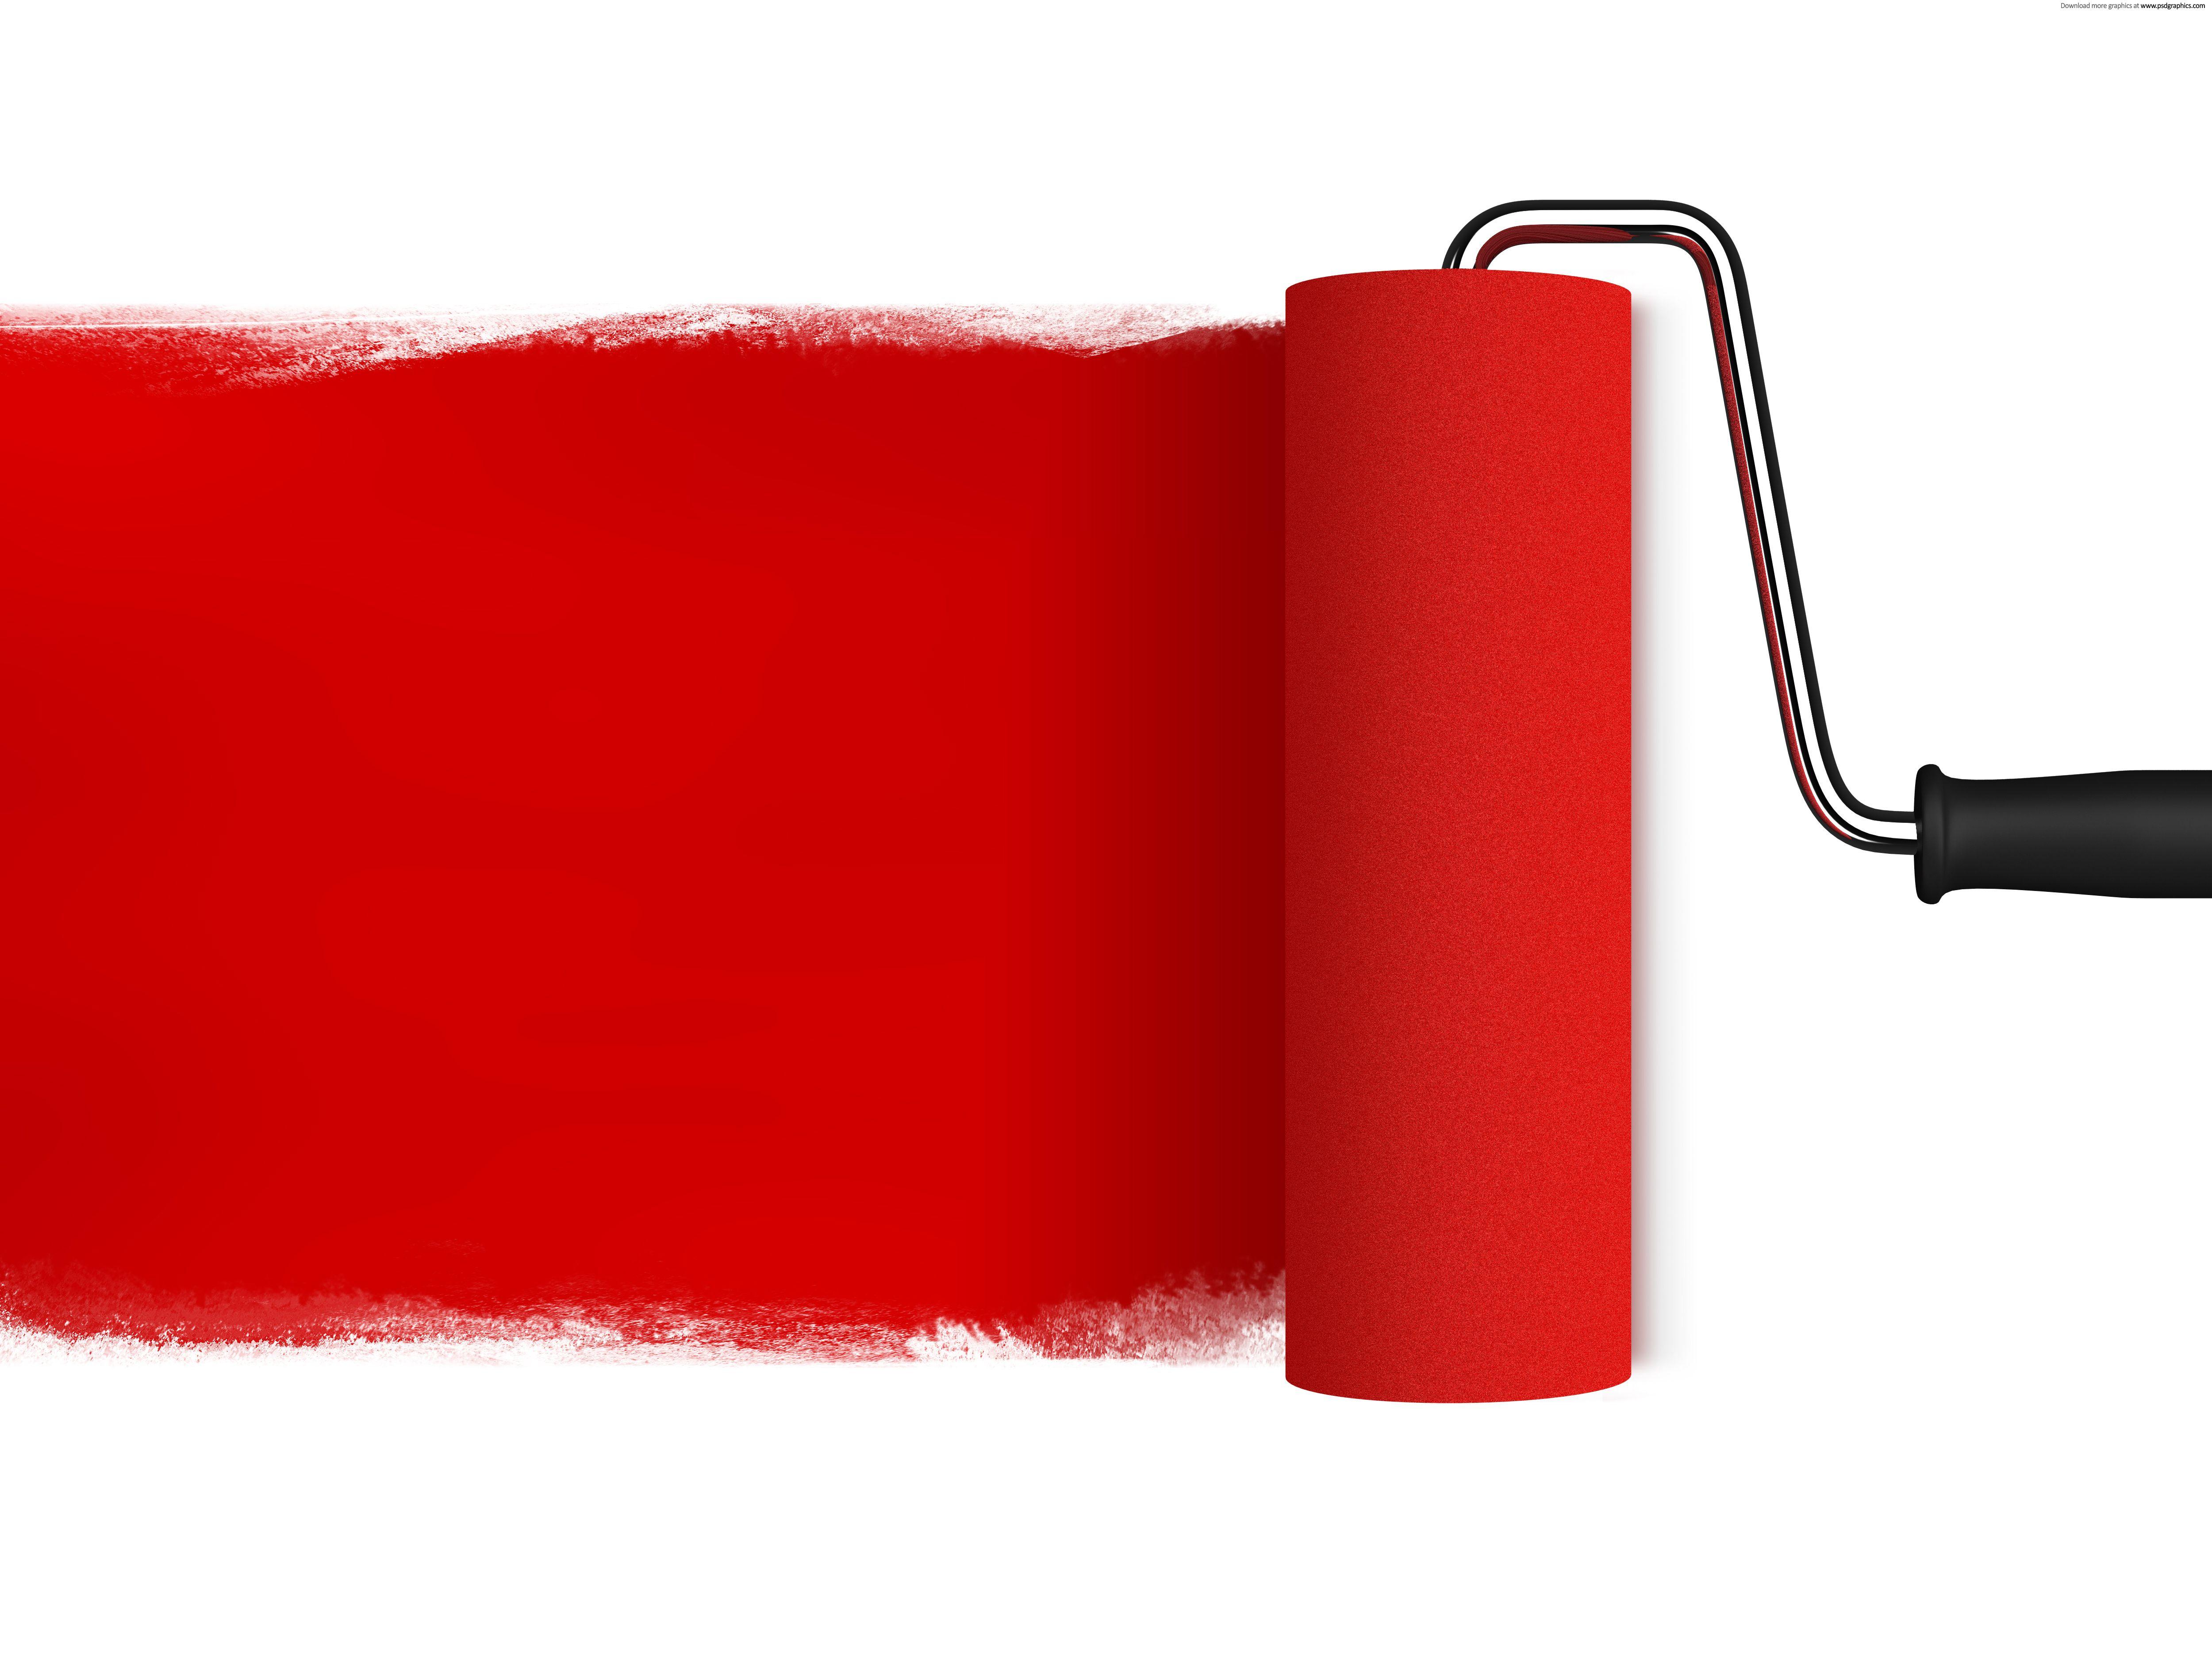 Red Paint Roller Red Paint Red Wall Paint Paint Roller